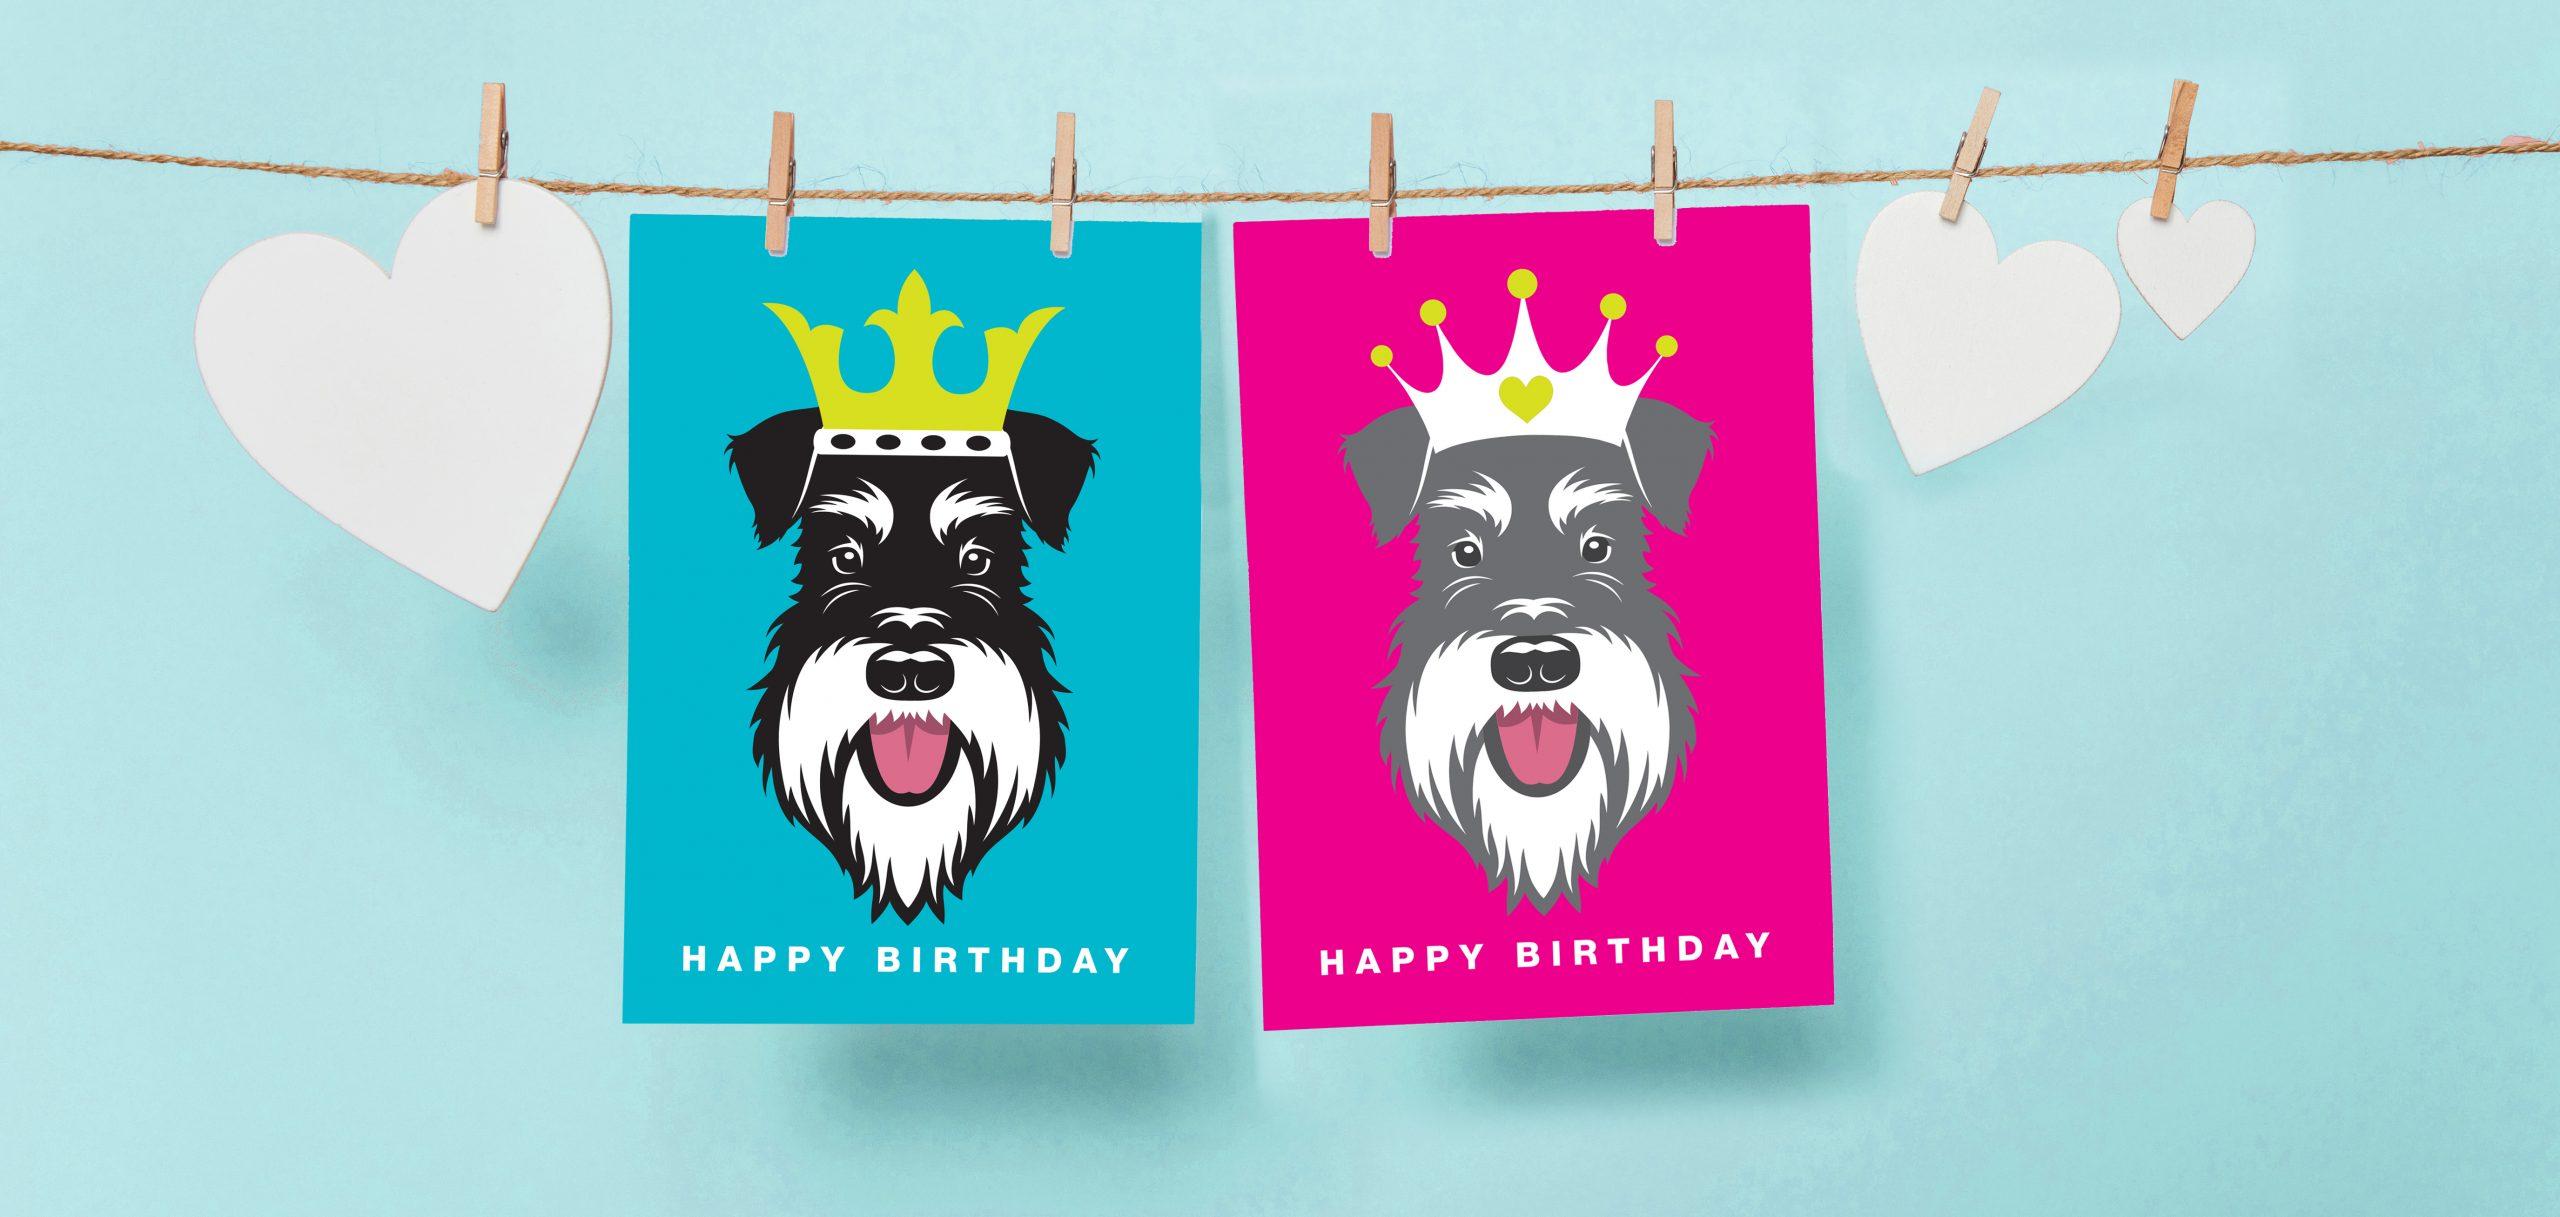 birthday cards on washing line